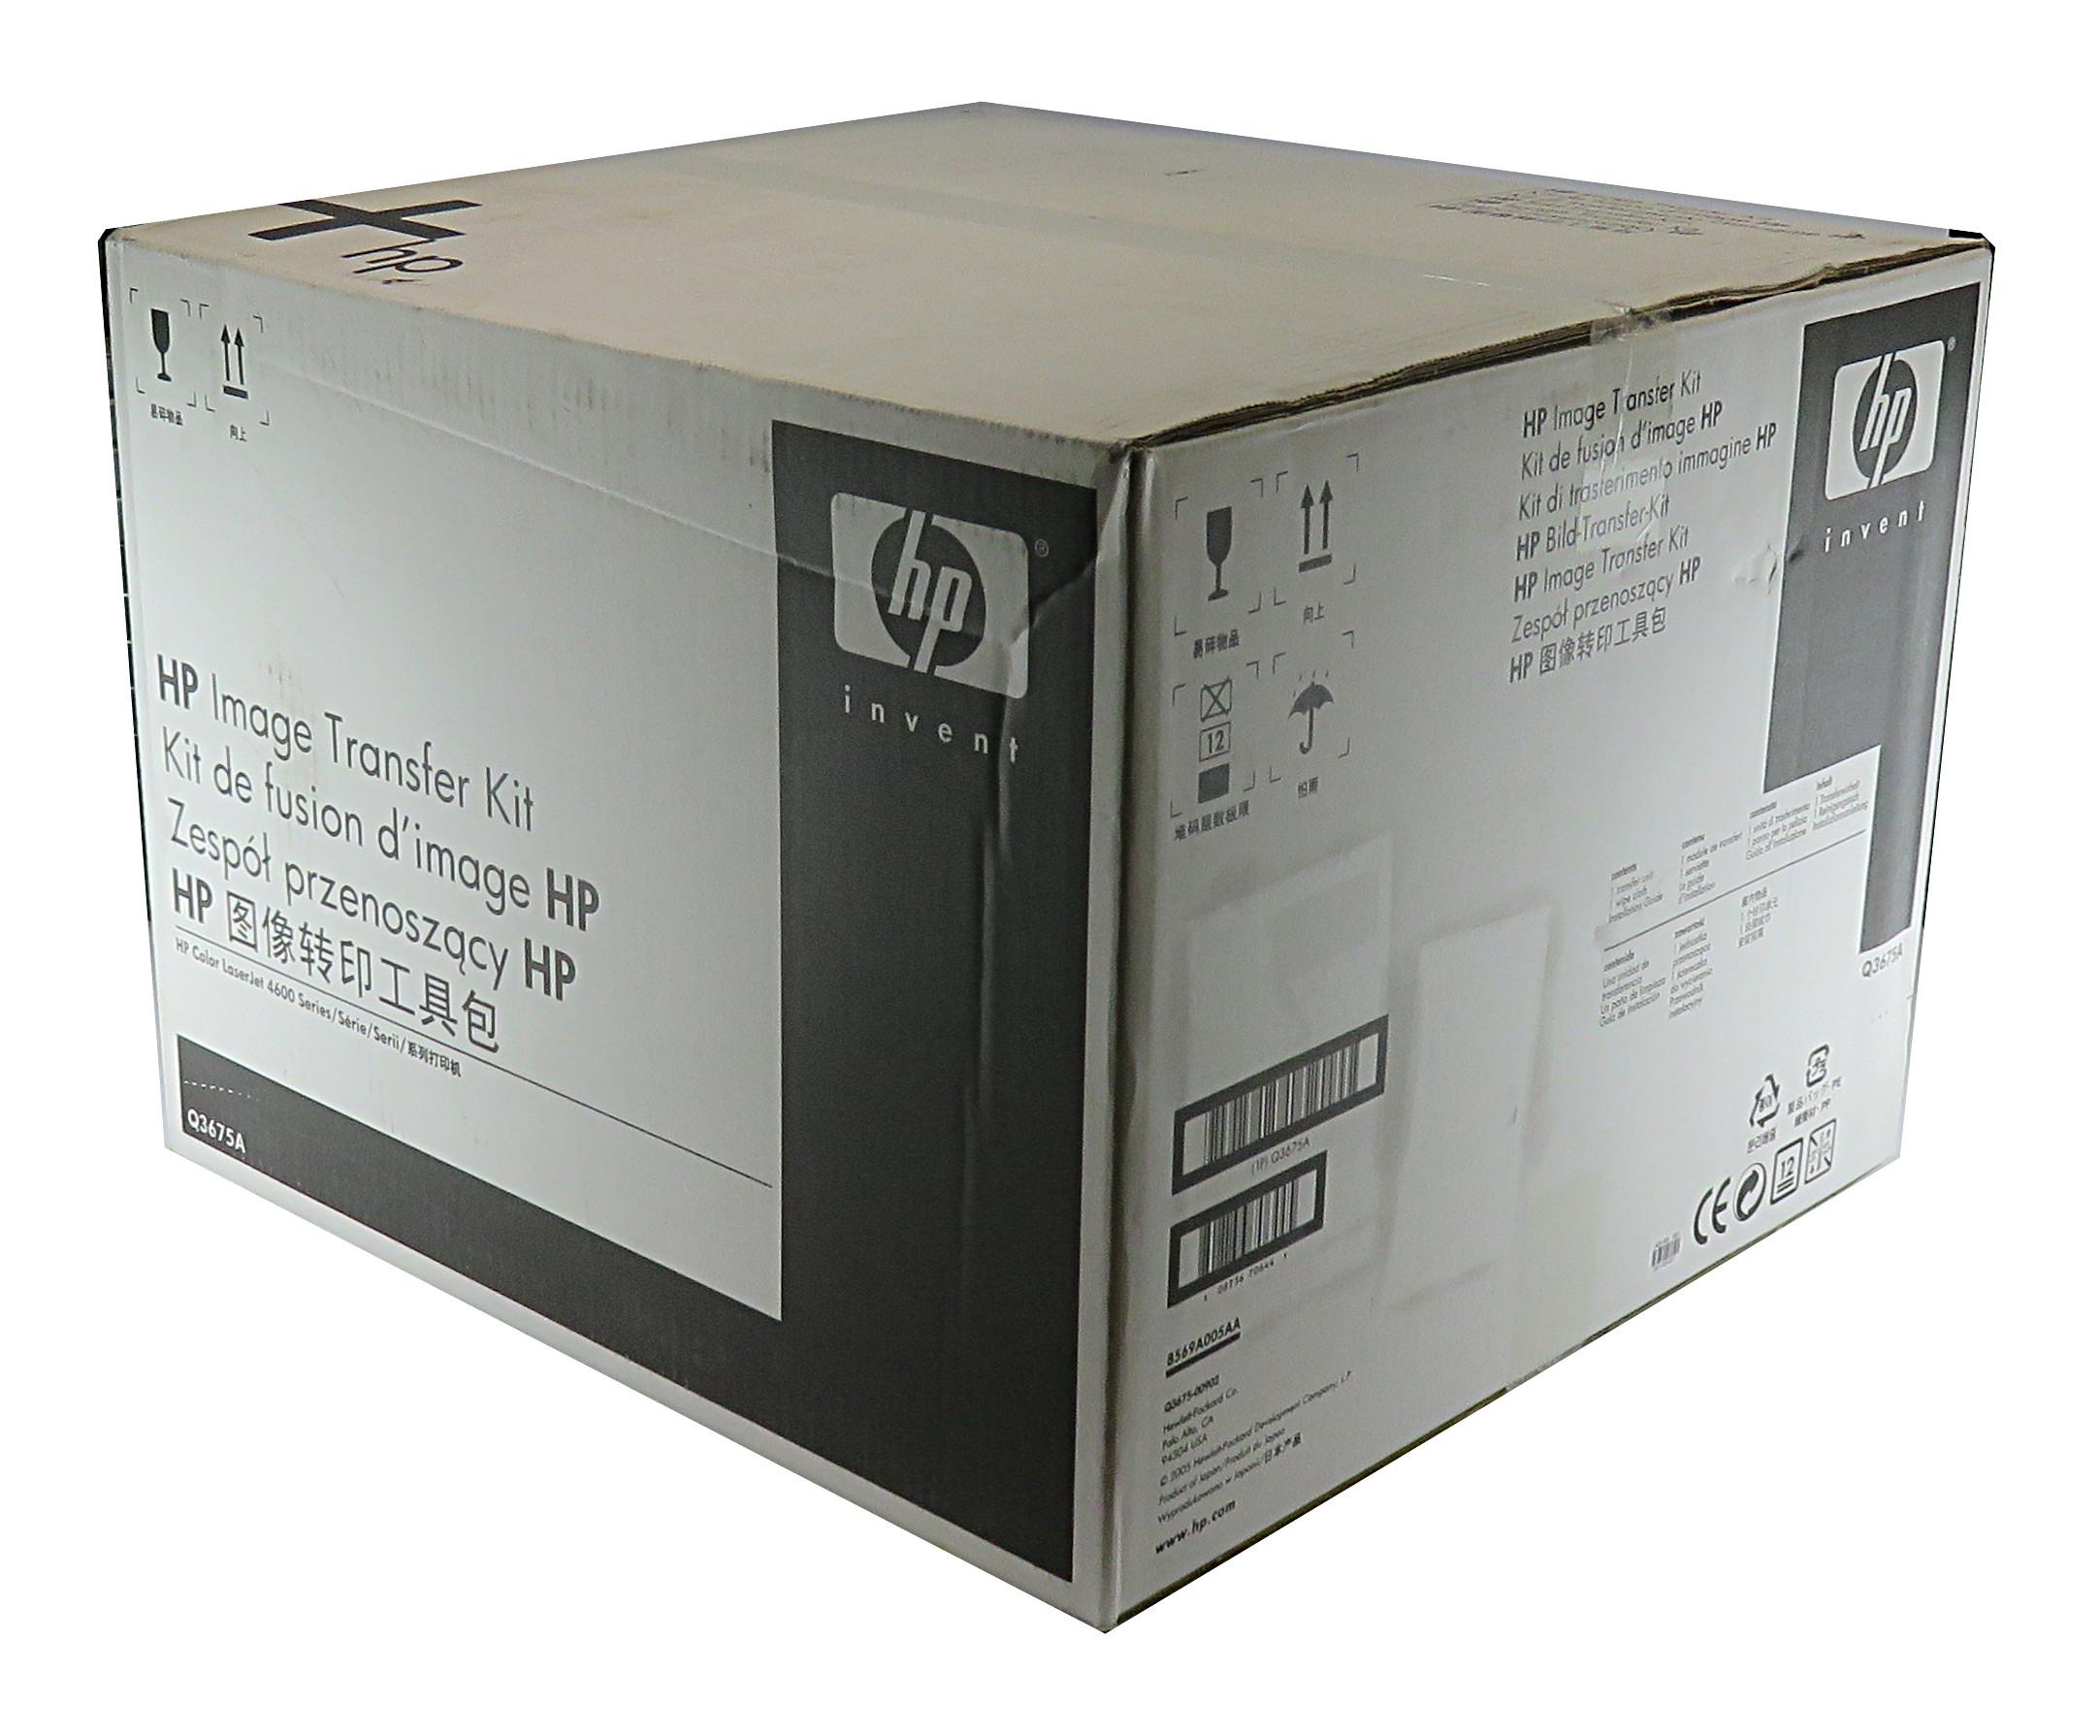 New HP Q3675A Image Transfer Kit